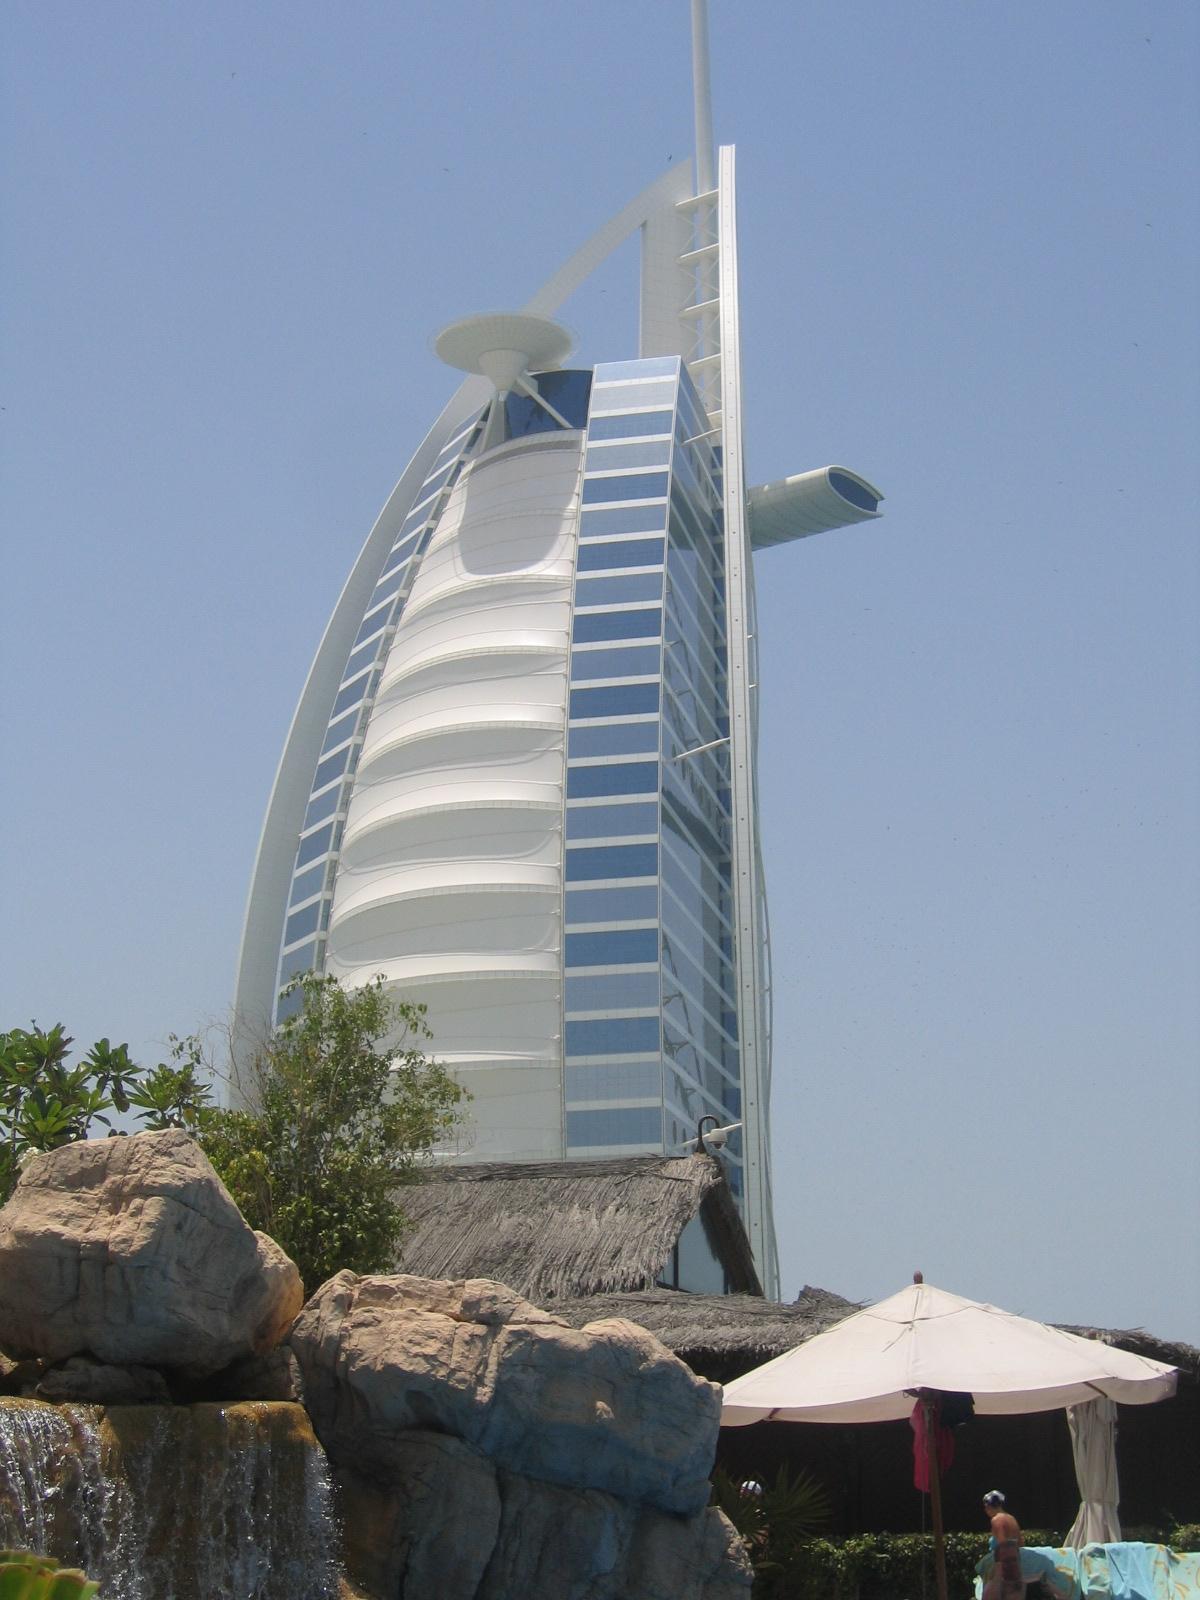 Asien News & Asien Infos & Asien Tipps @ Asien-123.de | Burj A arab Dubai, VAE Iranee